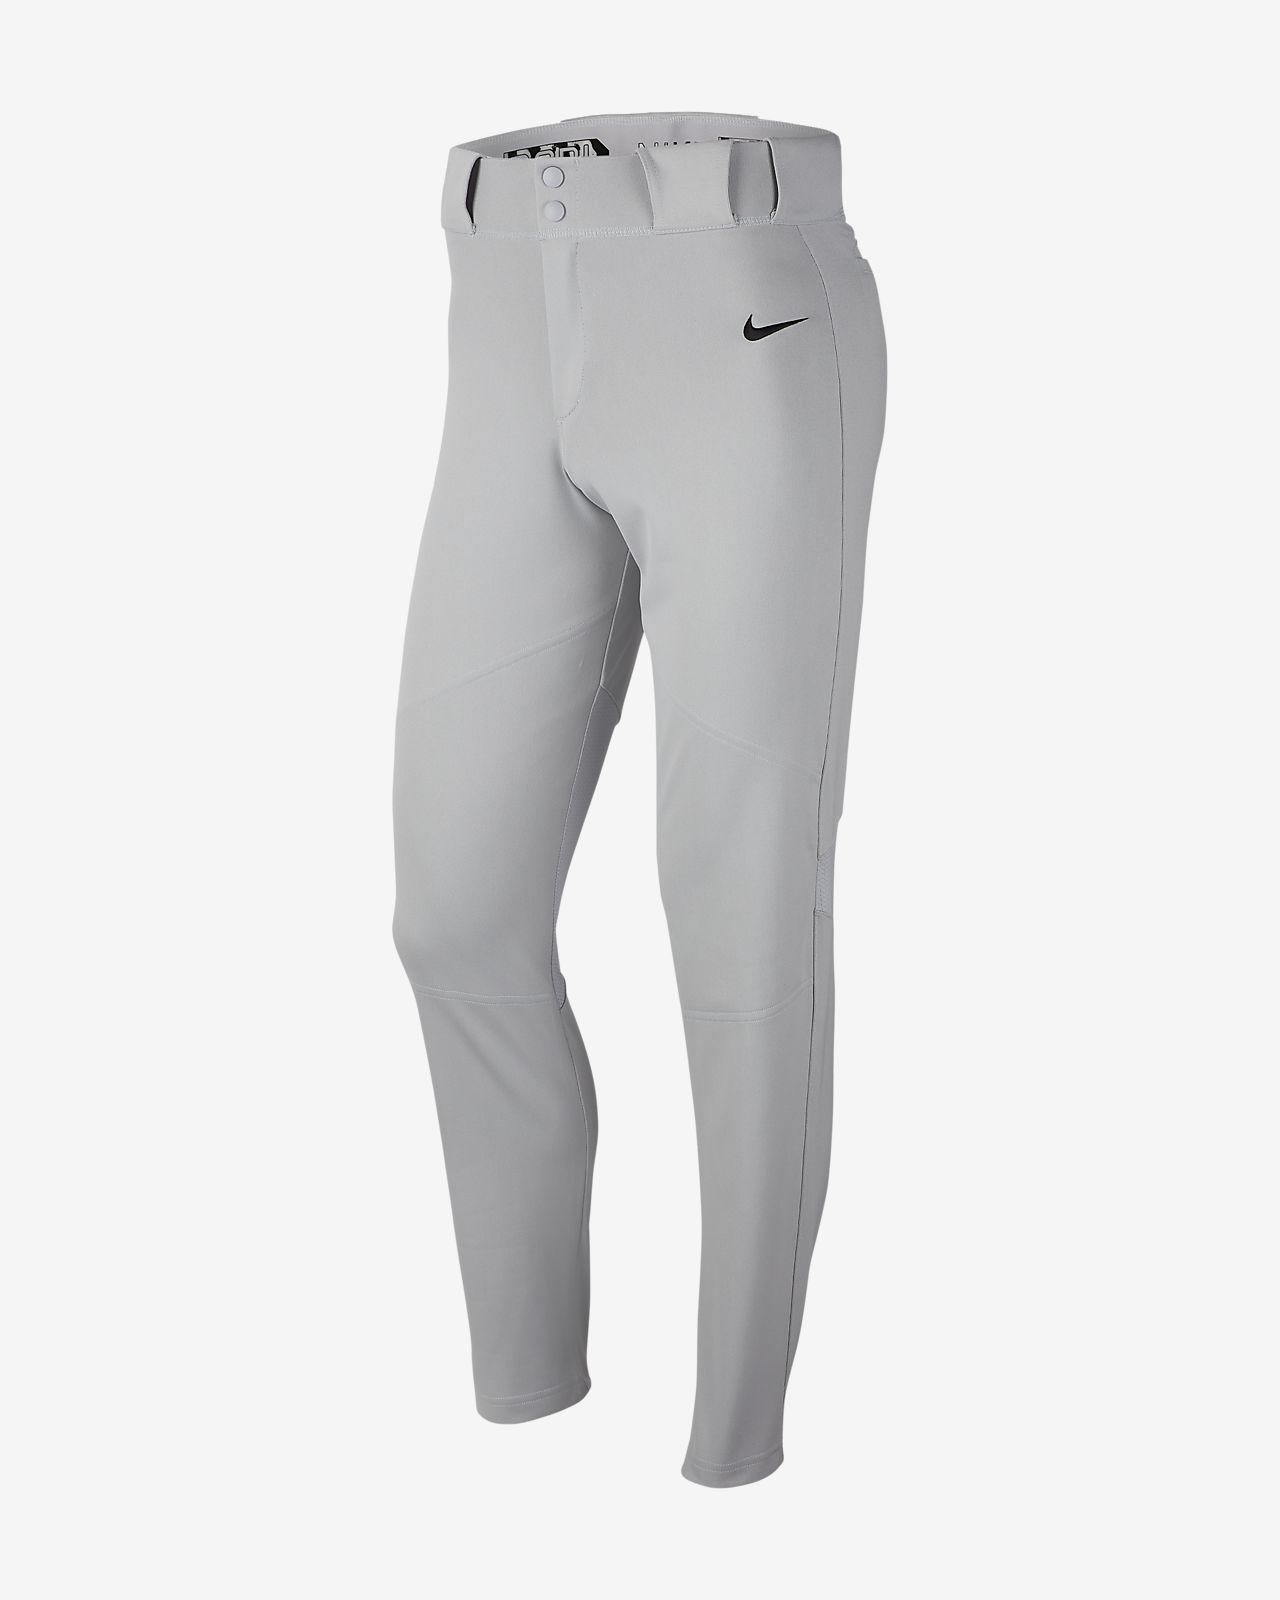 35feb43127ad82 Nike Pro Vapor Men s Baseball Pants. Nike.com